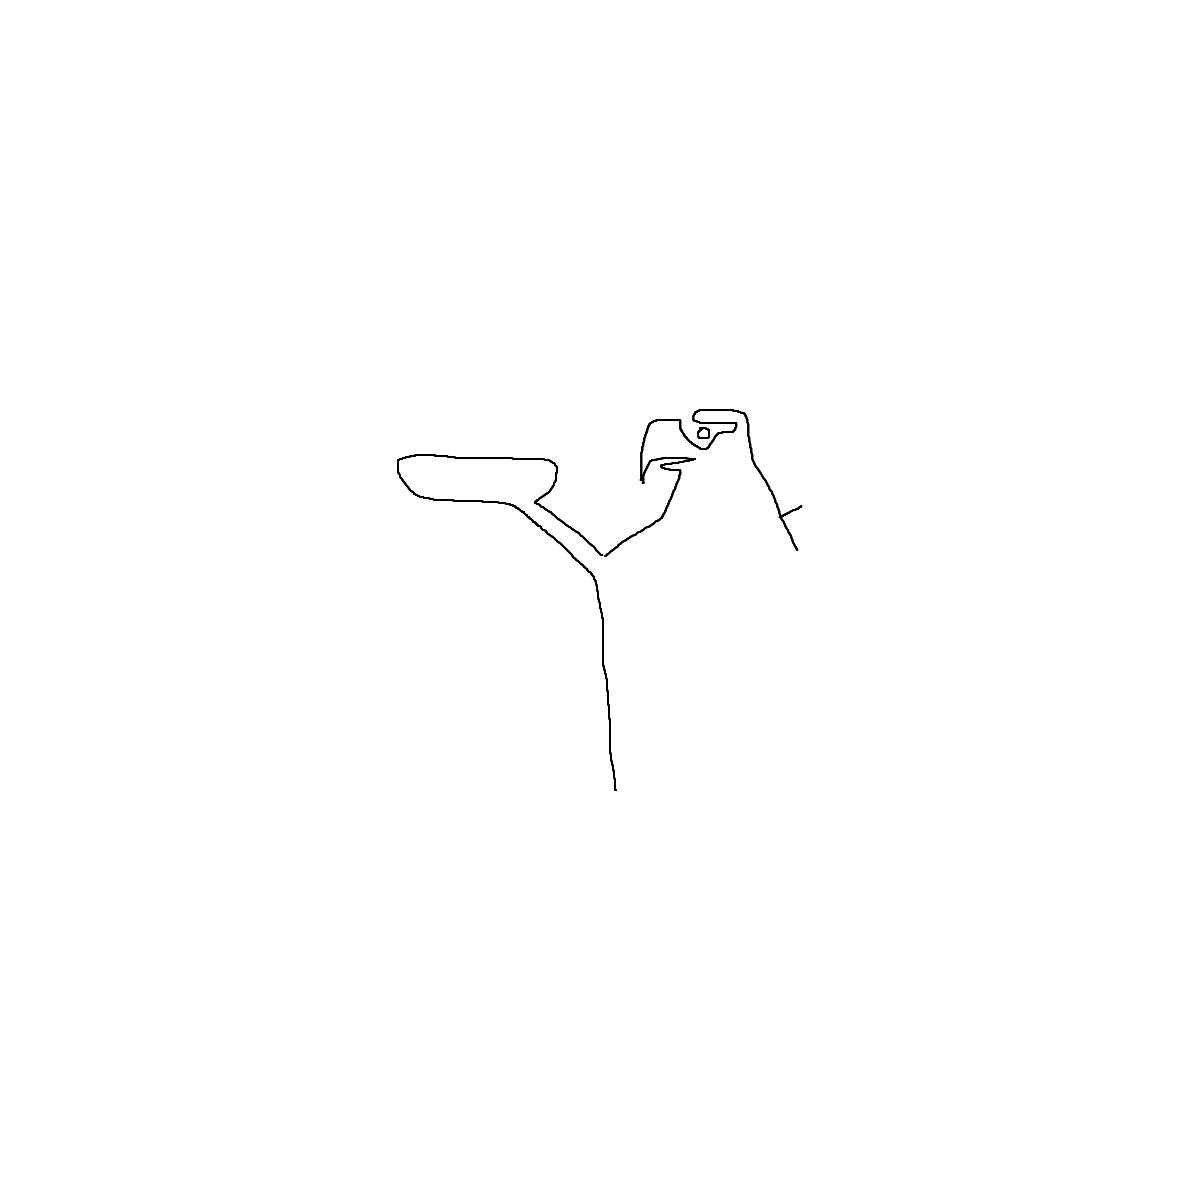 BAAAM drawing#19125 lat:60.3900756835937500lng: 25.6670932769775400